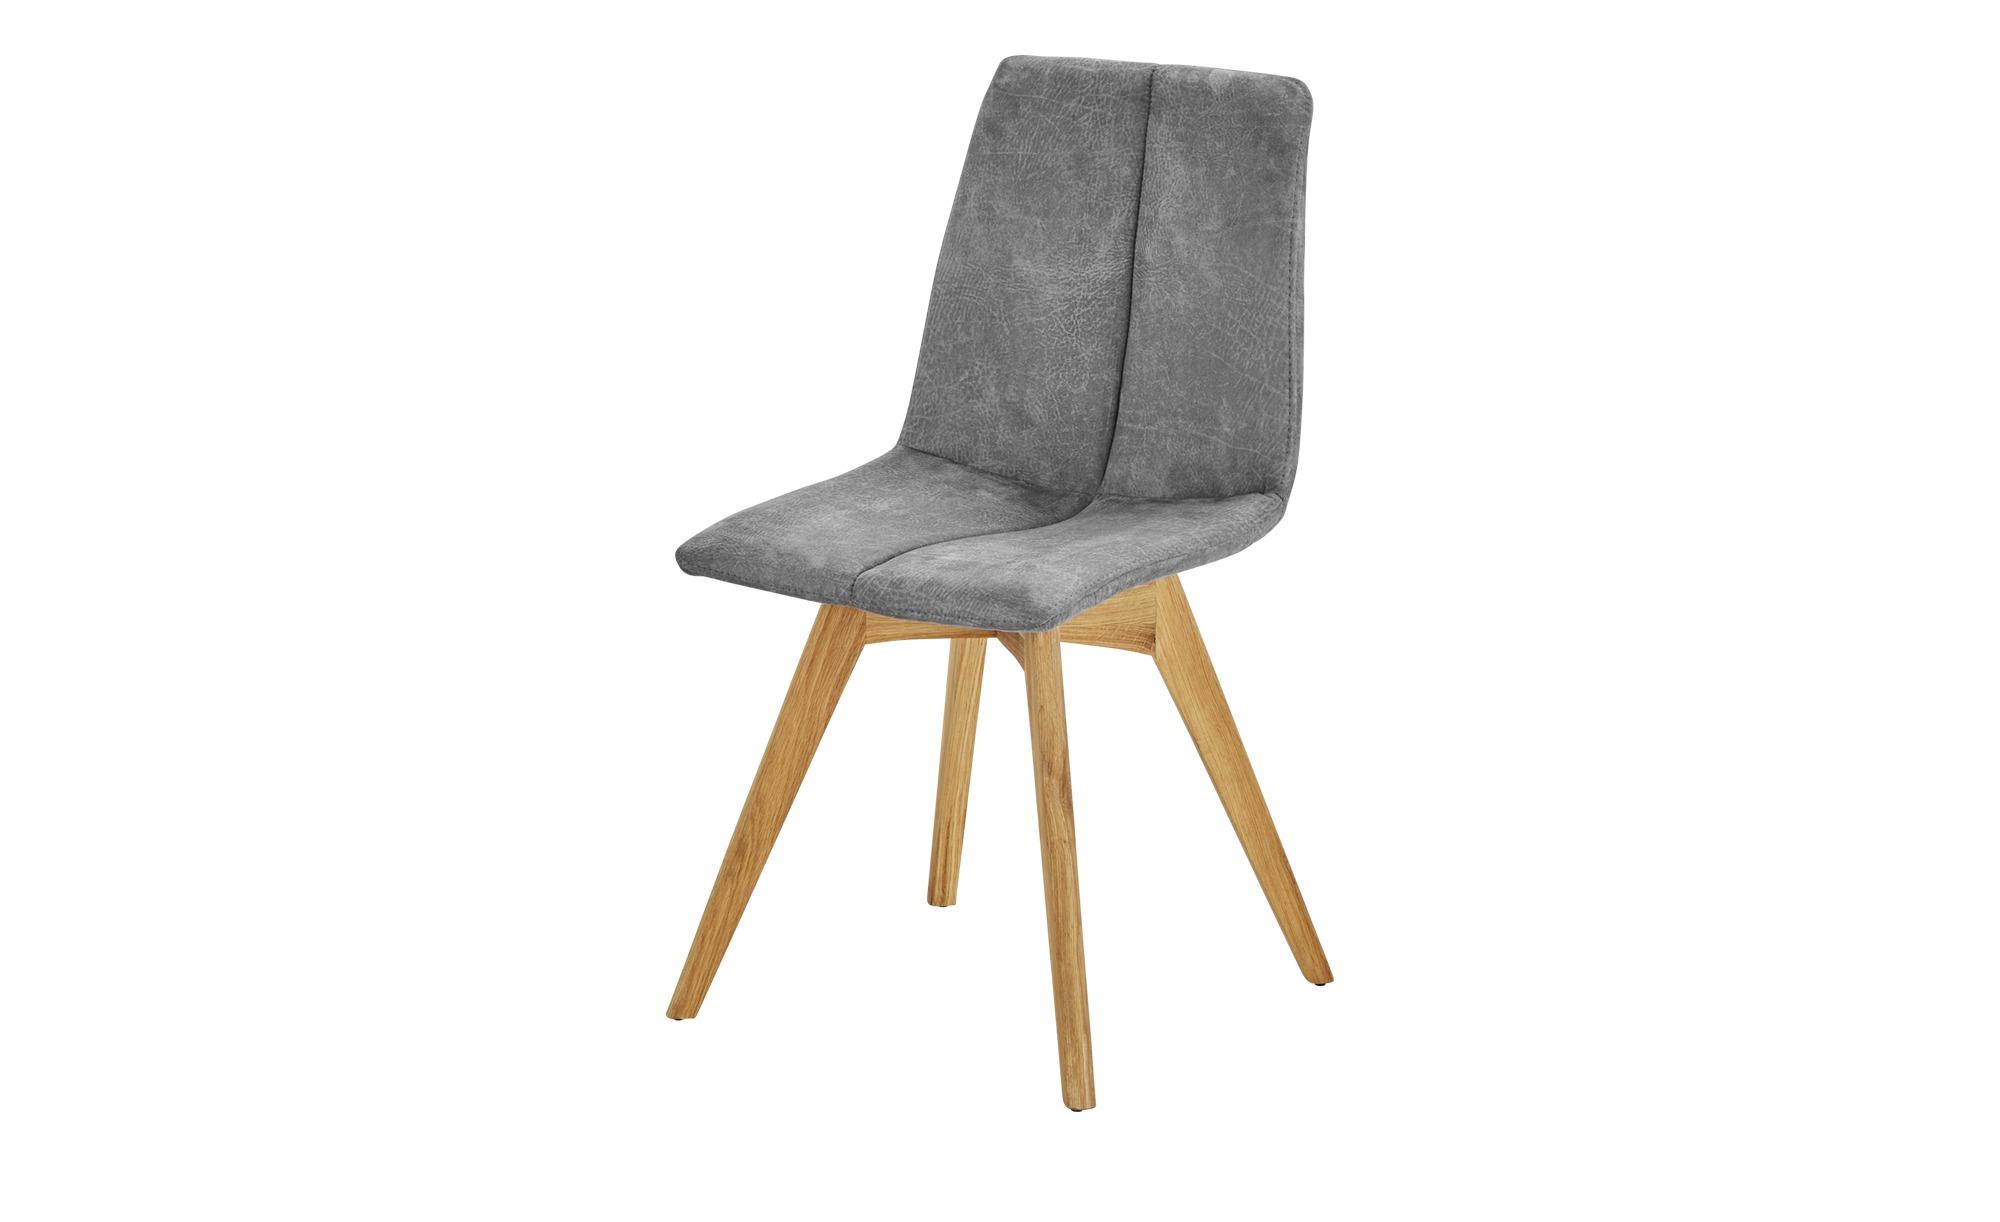 Woodford Polsterstuhl Marven grau 47 cm 87 cm 52 cm Stühle > Esszimmerstühle Möbel Kraft